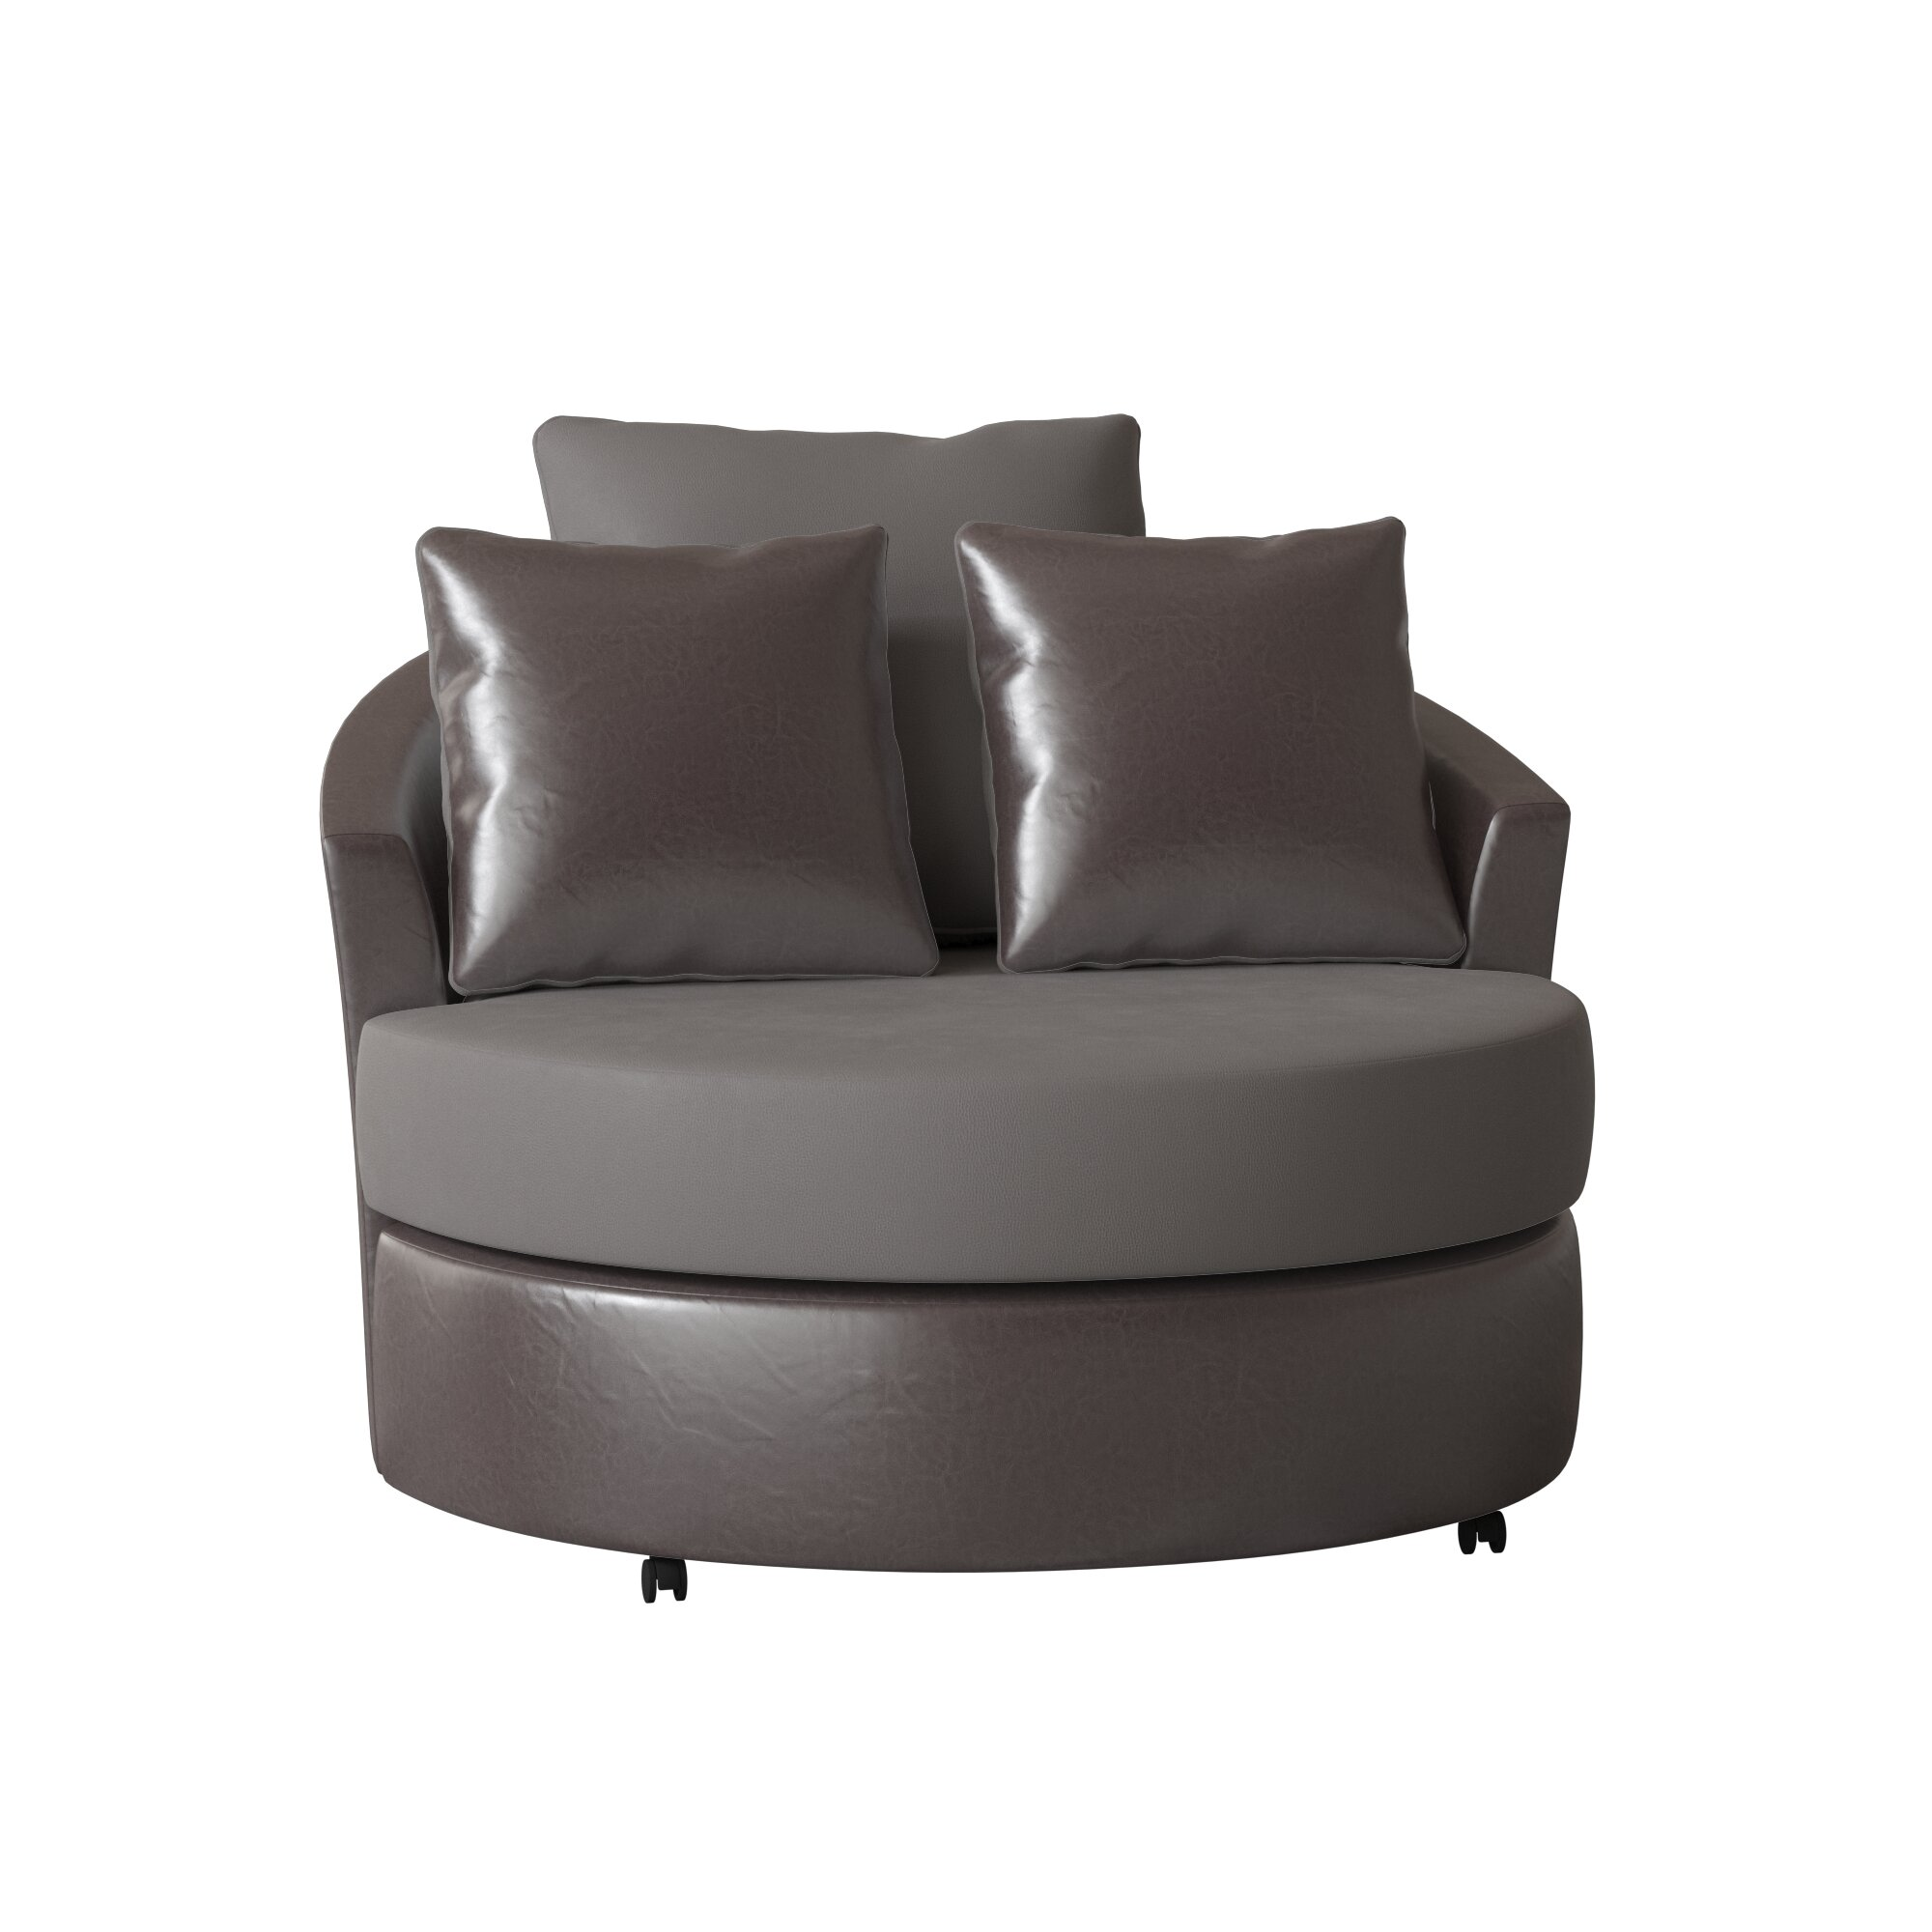 Strange Piedmont Furniture Ella Swivel Barrel Chair Reviews Wayfair Pabps2019 Chair Design Images Pabps2019Com